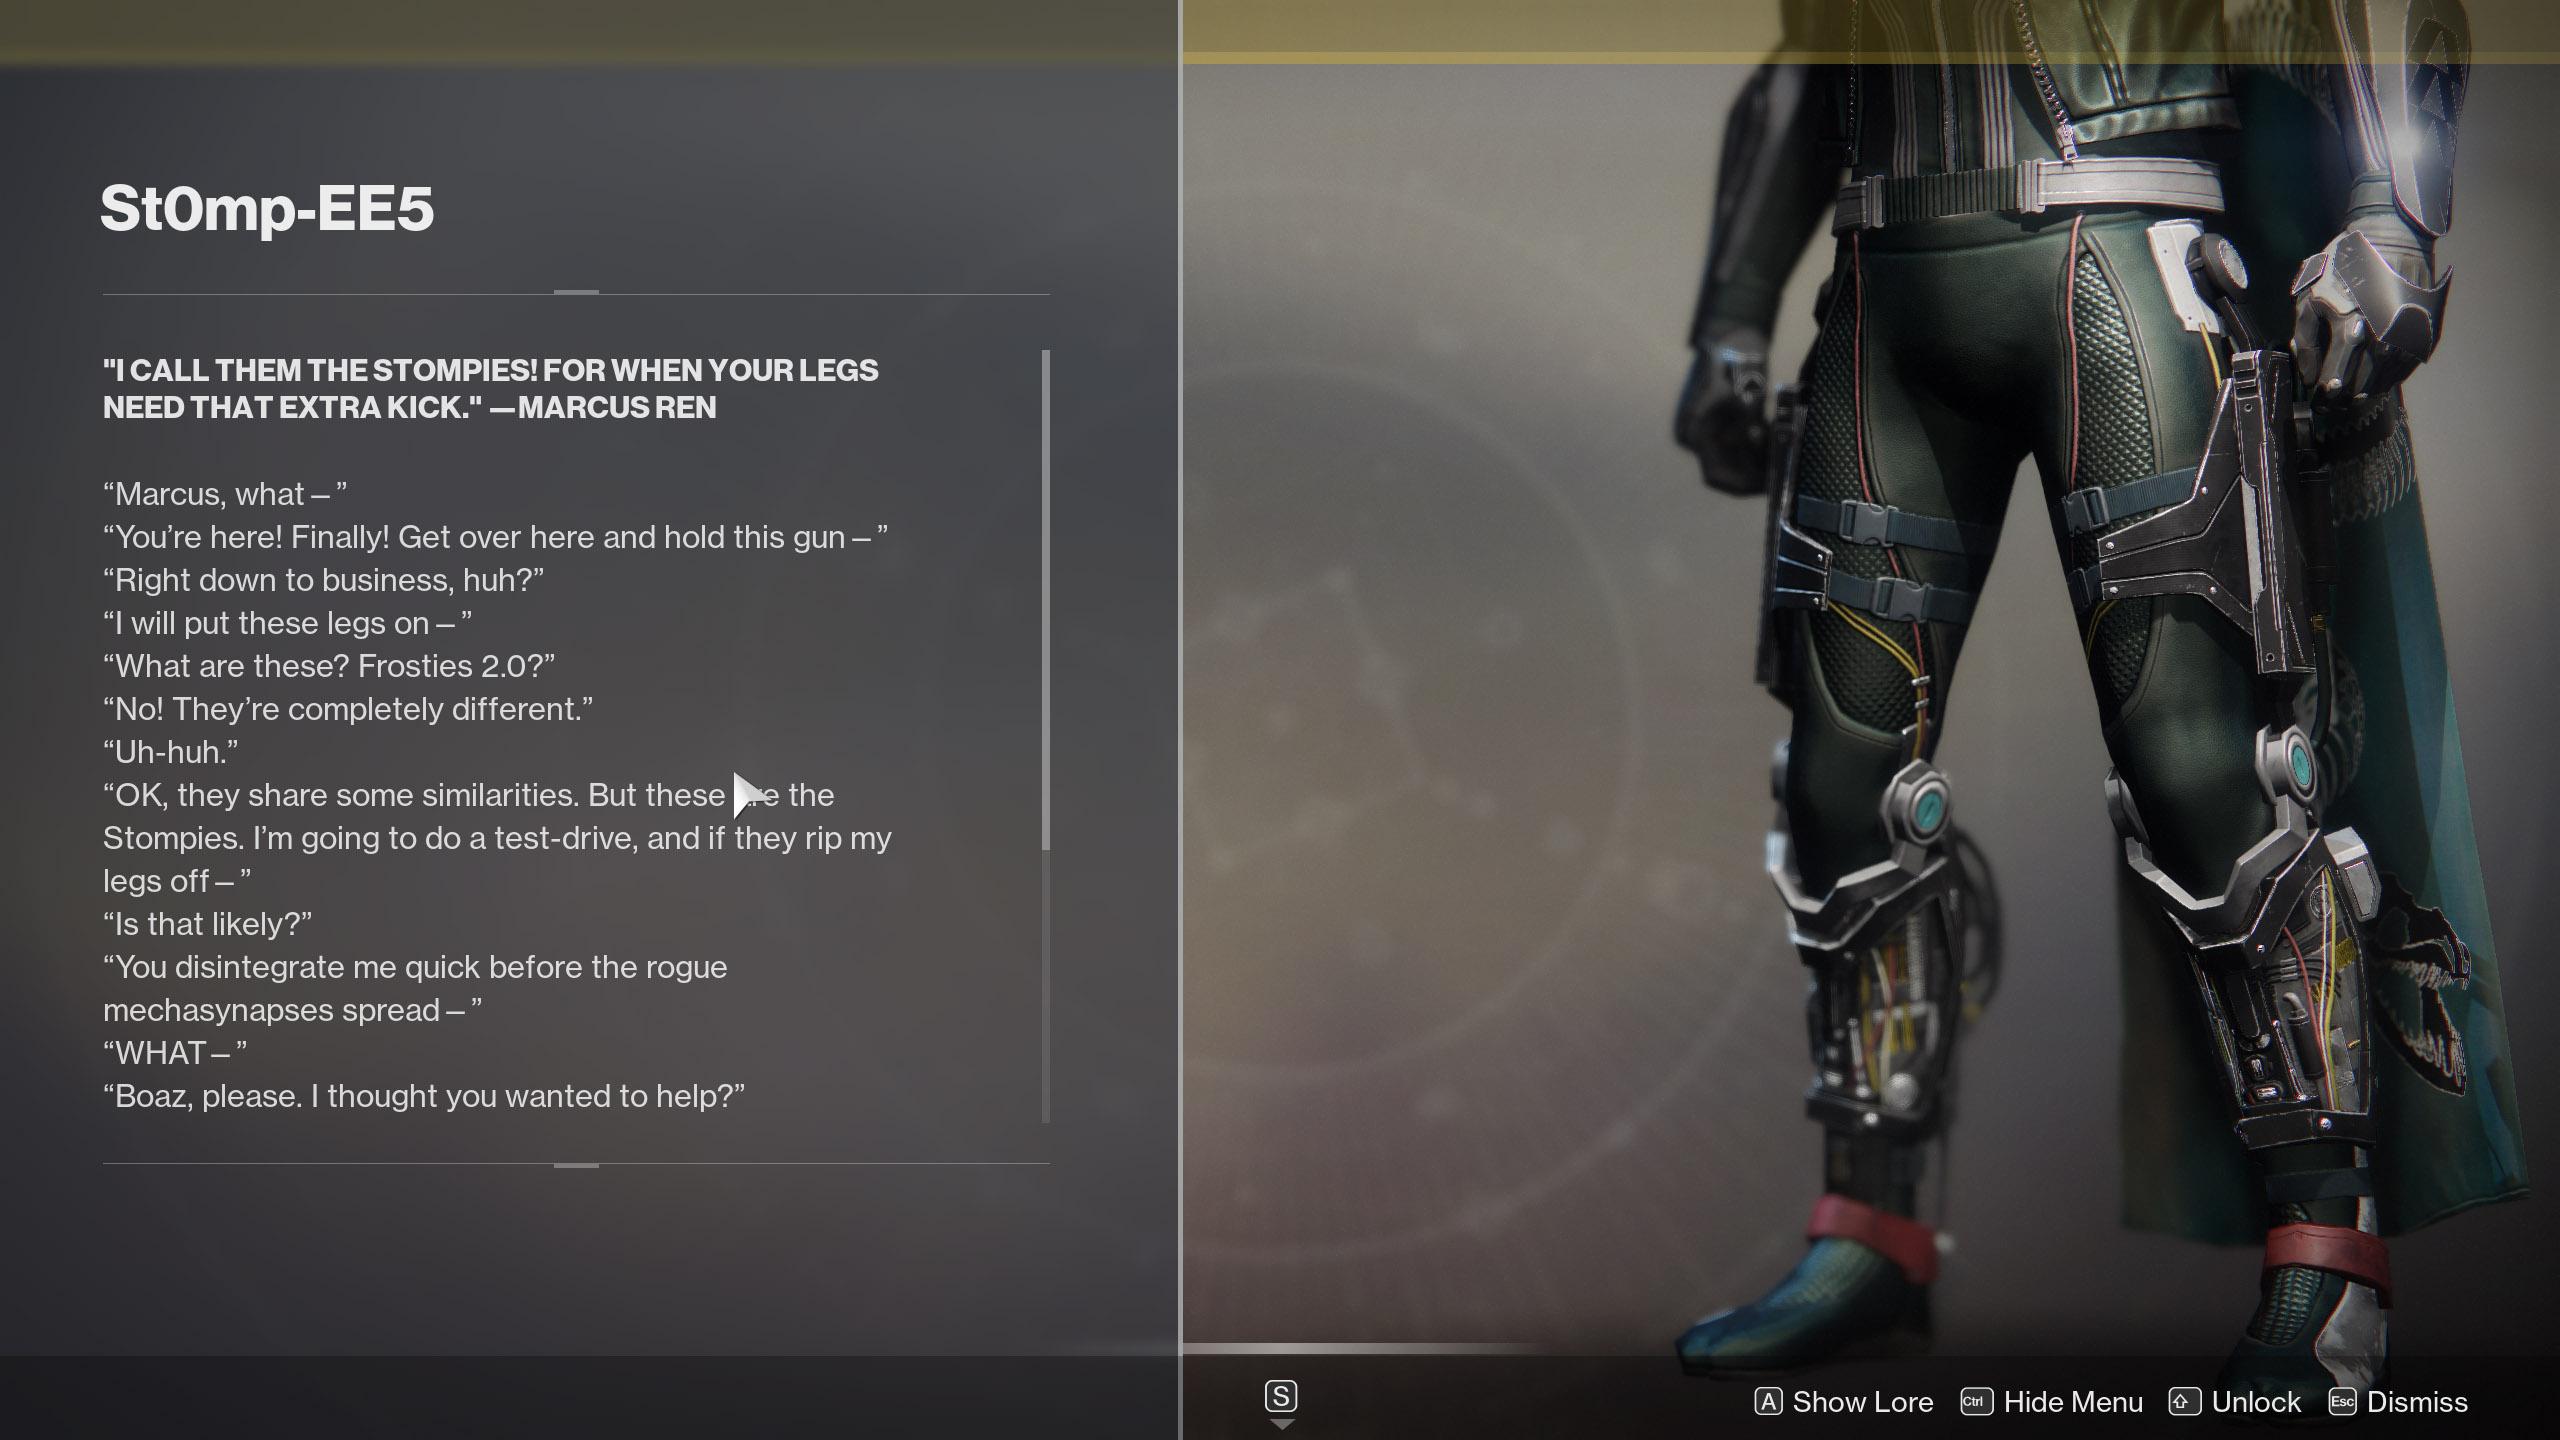 St0mp-EE5 Lore Destiny 2